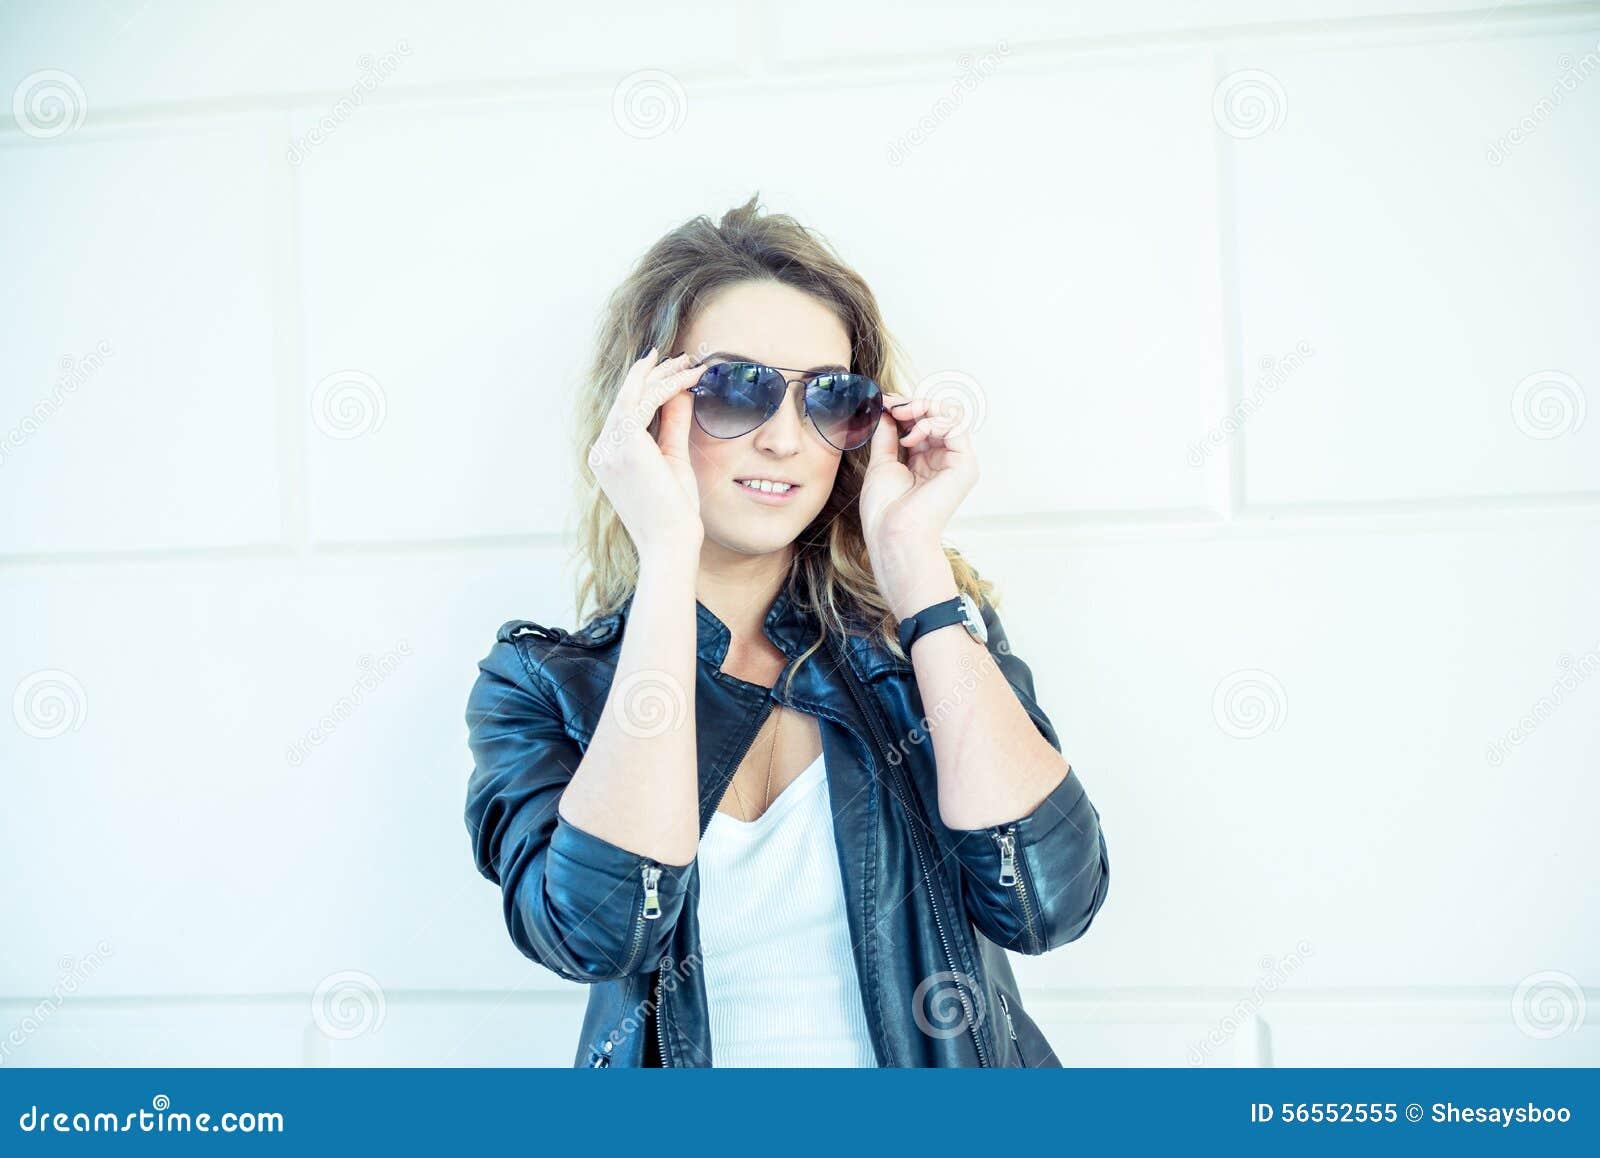 Download Τοποθέτηση κοριτσιών μόδας με το σακάκι δέρματος Στοκ Εικόνα - εικόνα από ευτυχία, άνθρωποι: 56552555